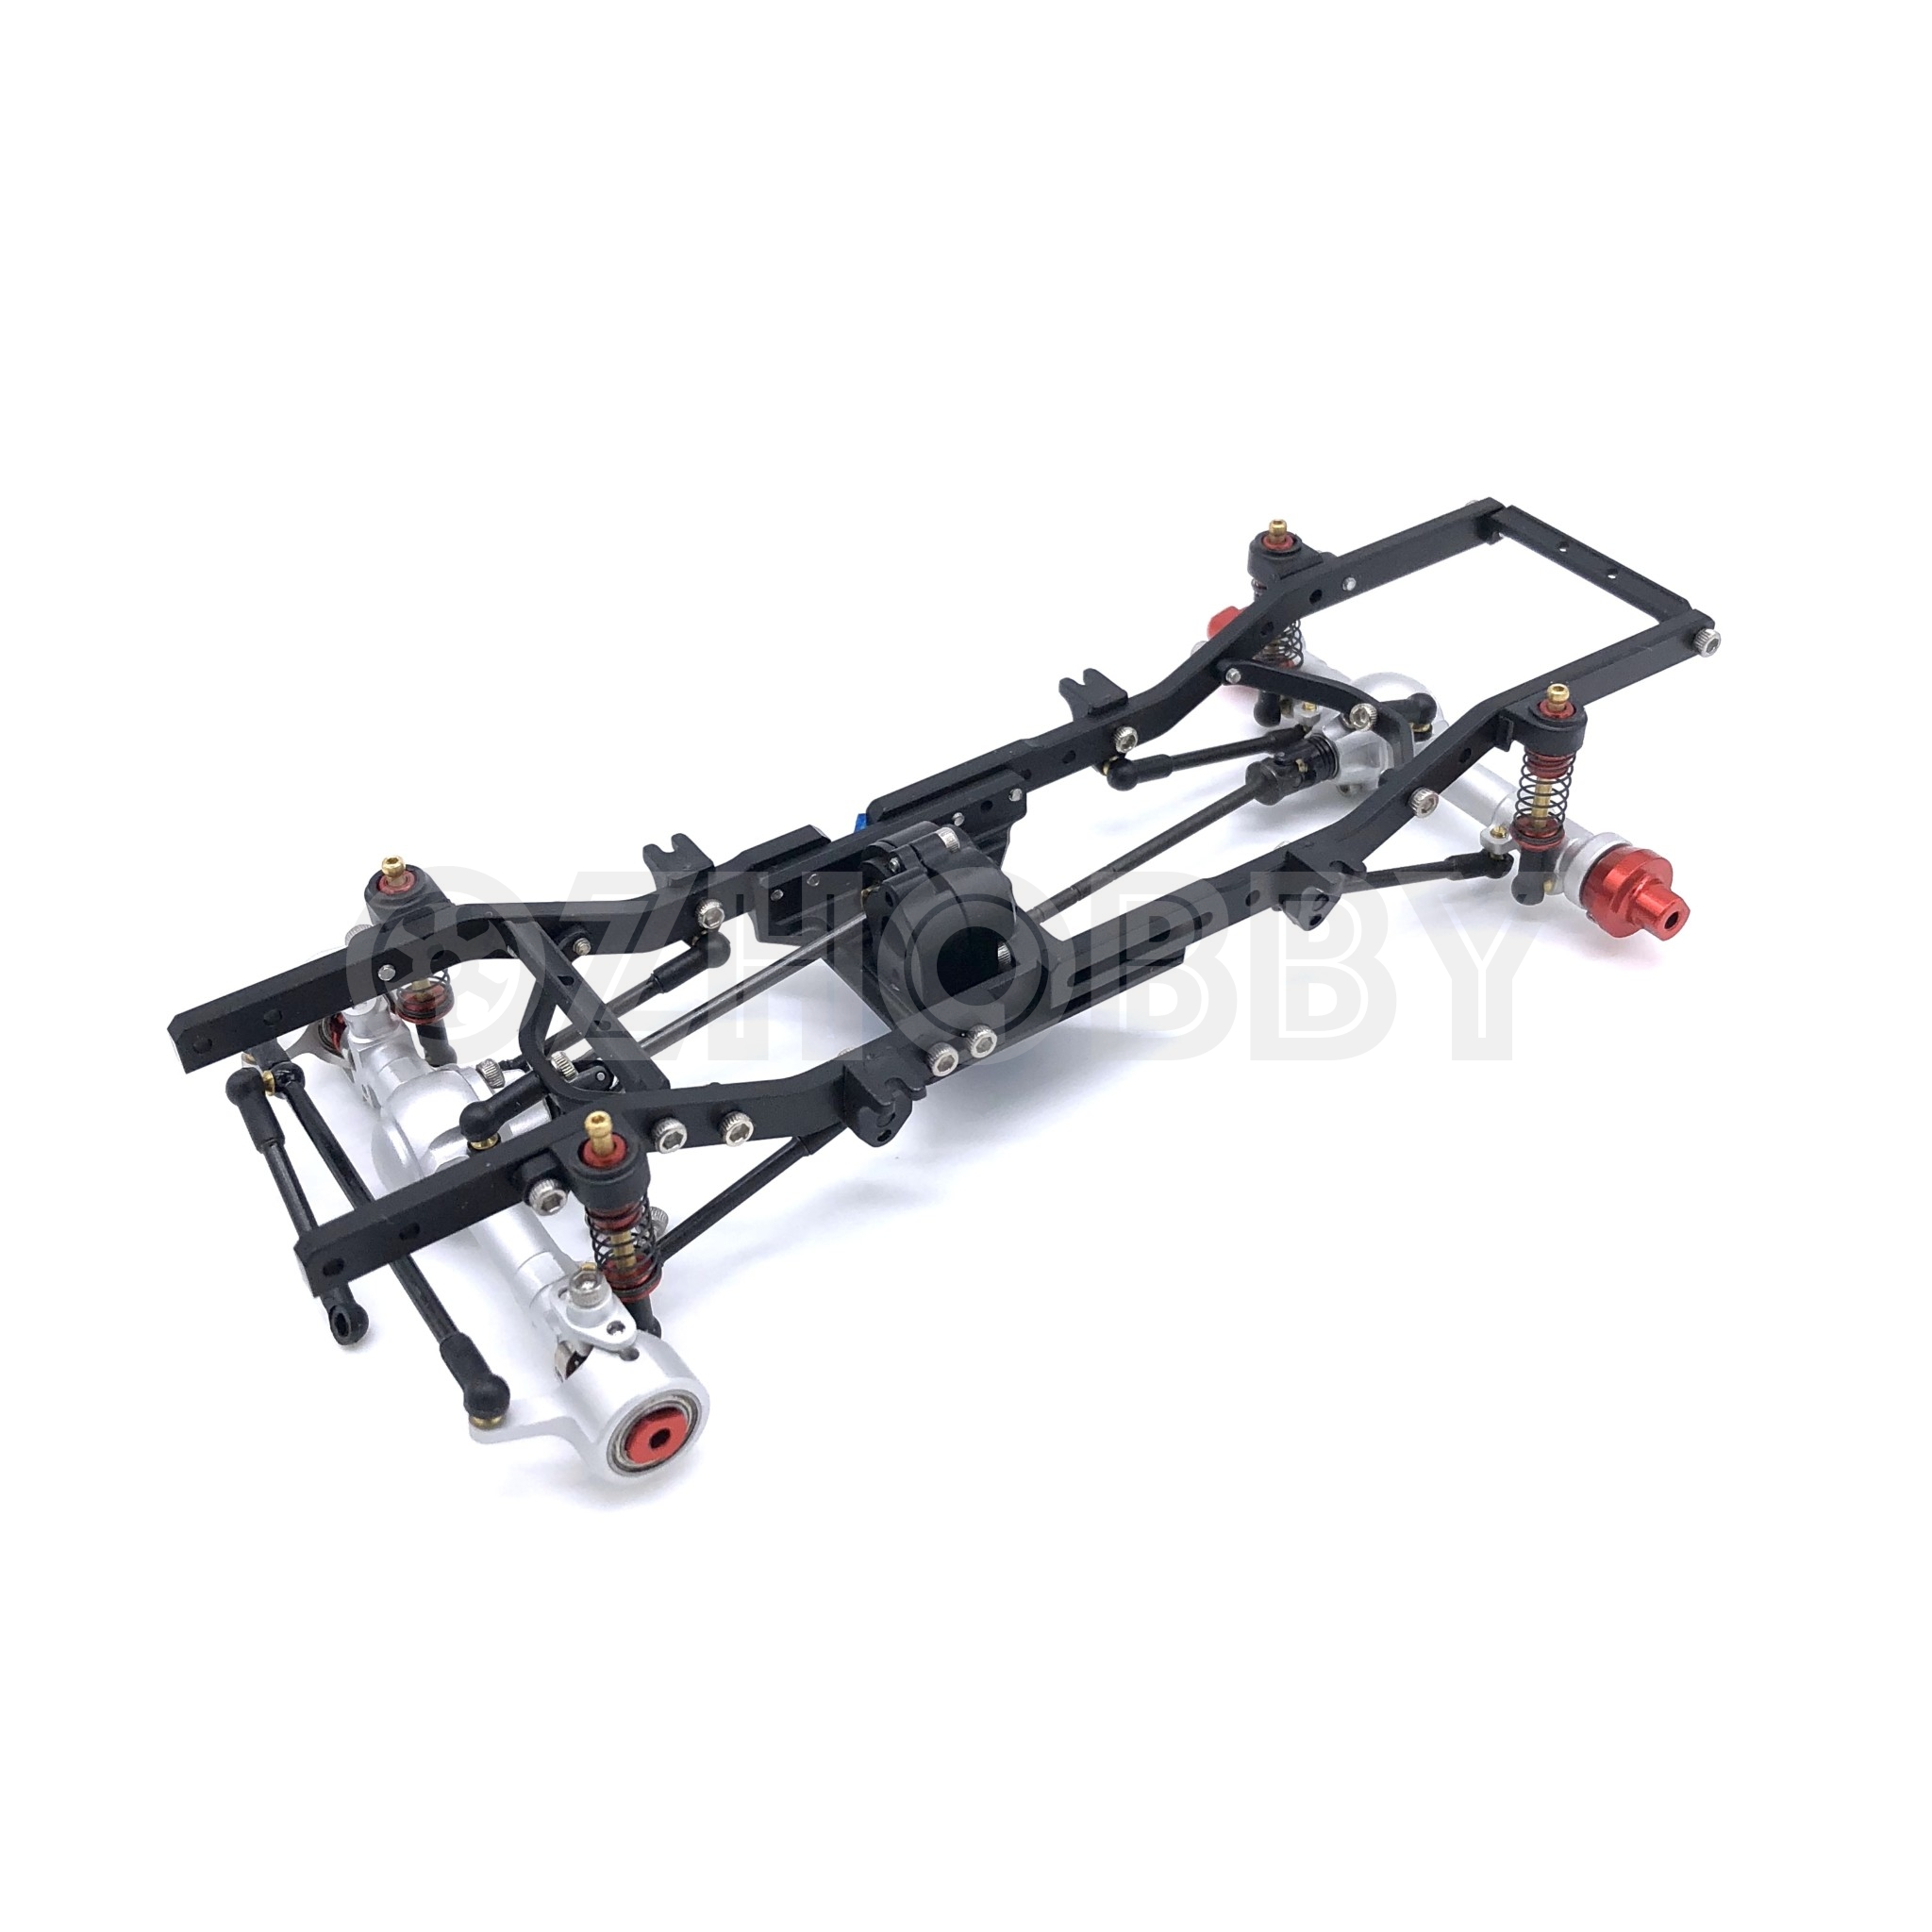 Autorc 1 24 Gk24 V3 Micro Rc Crawler Full Metal Chassis